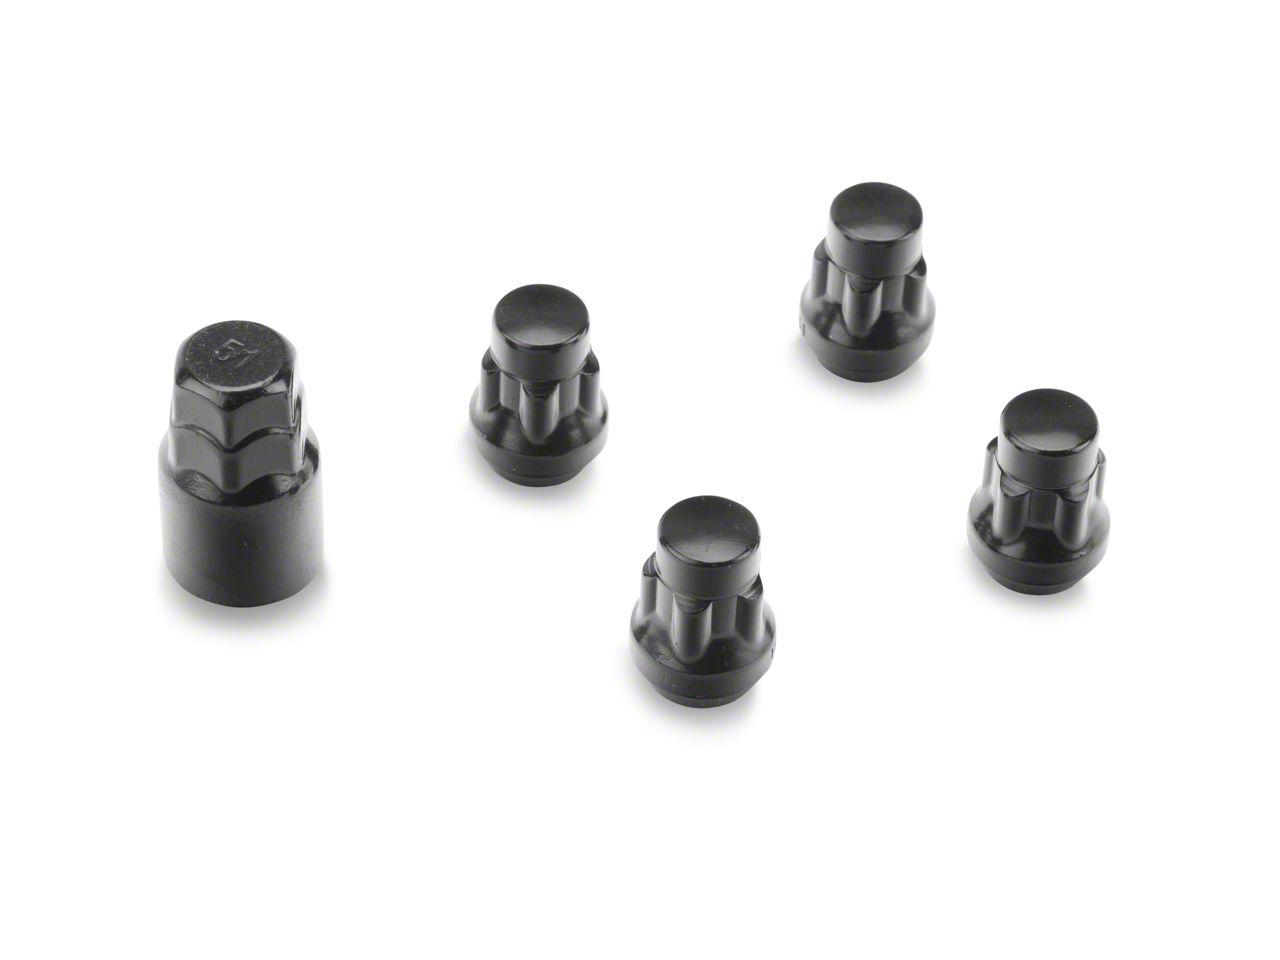 Coyote Locks with Key for Black Acorn Lug Nuts - 14mm x 1.5 (12-18 RAM 1500)